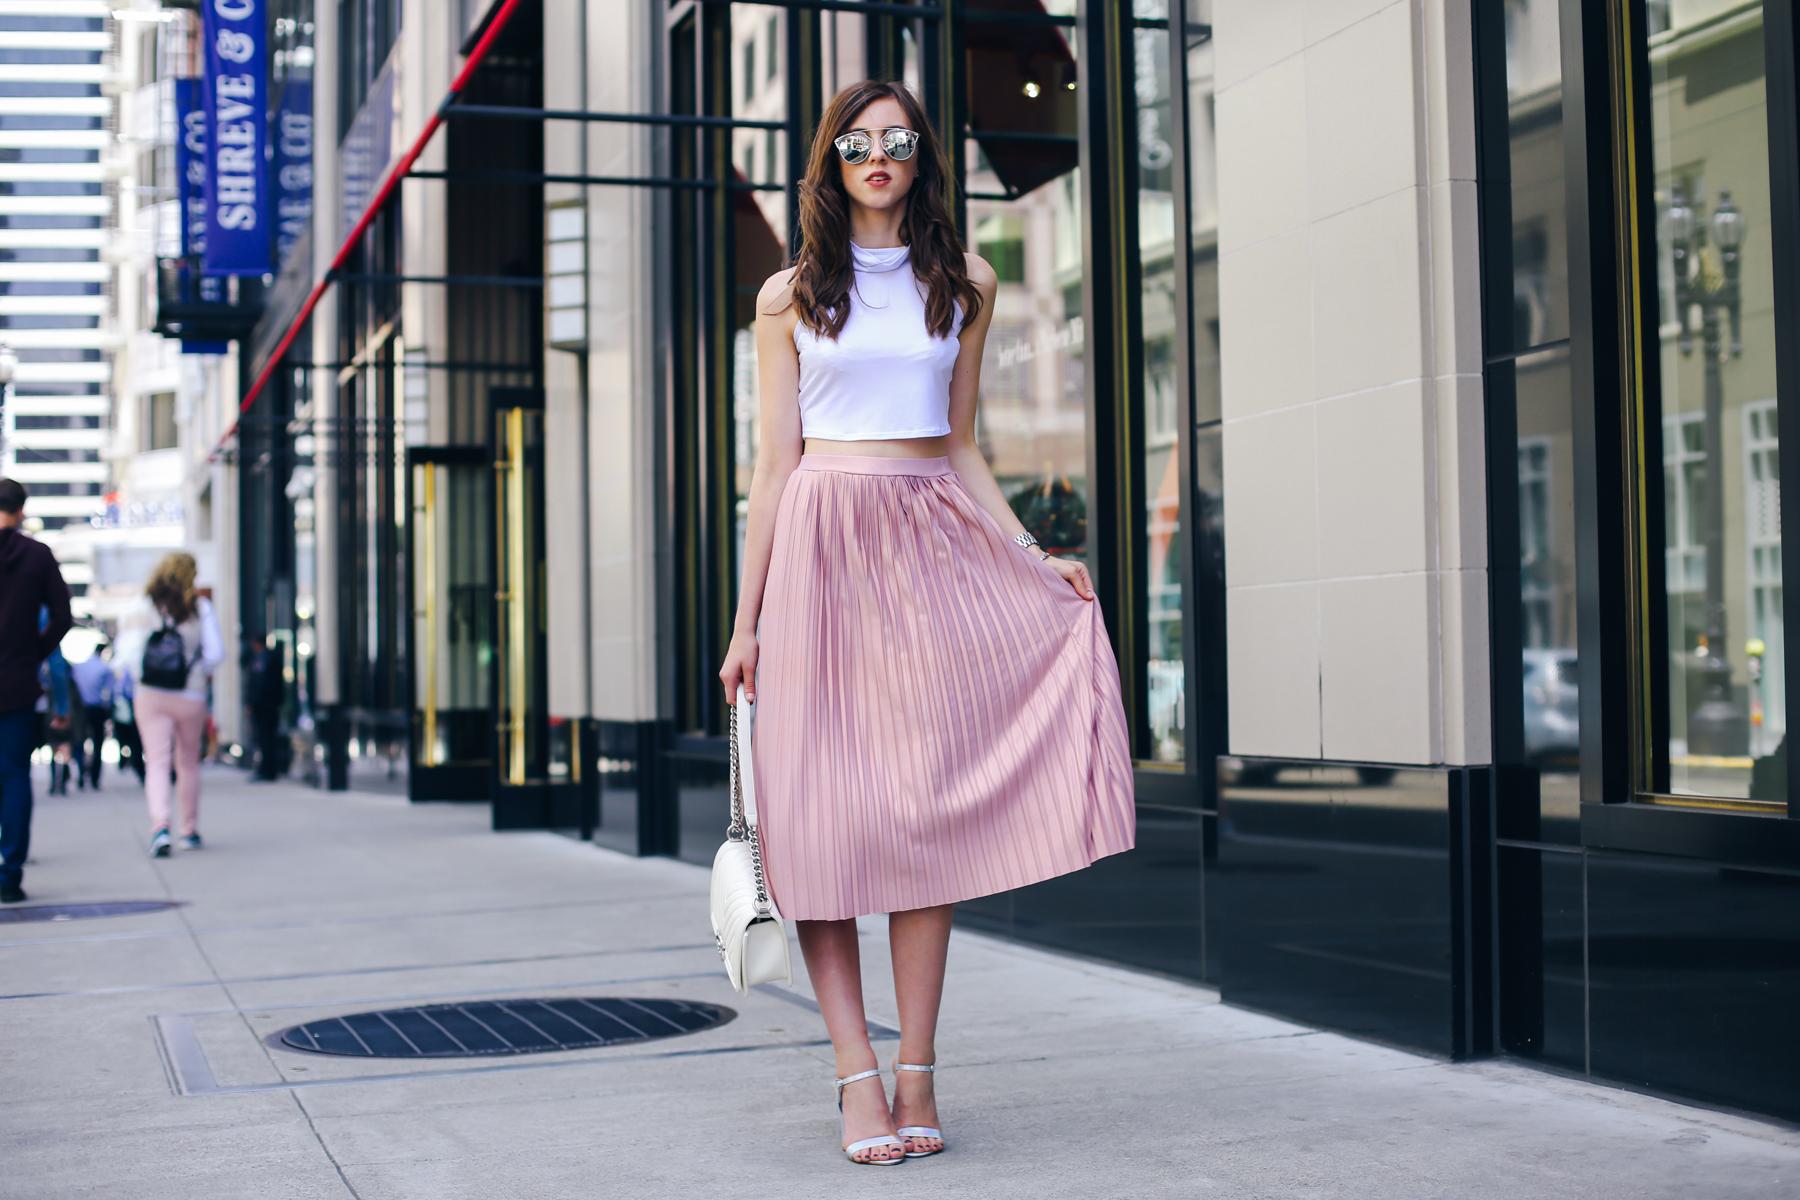 Barbora-Ondracova-FashioninmySoul-Fashion-Blogger-Photography-RyanbyRyanChua-7425